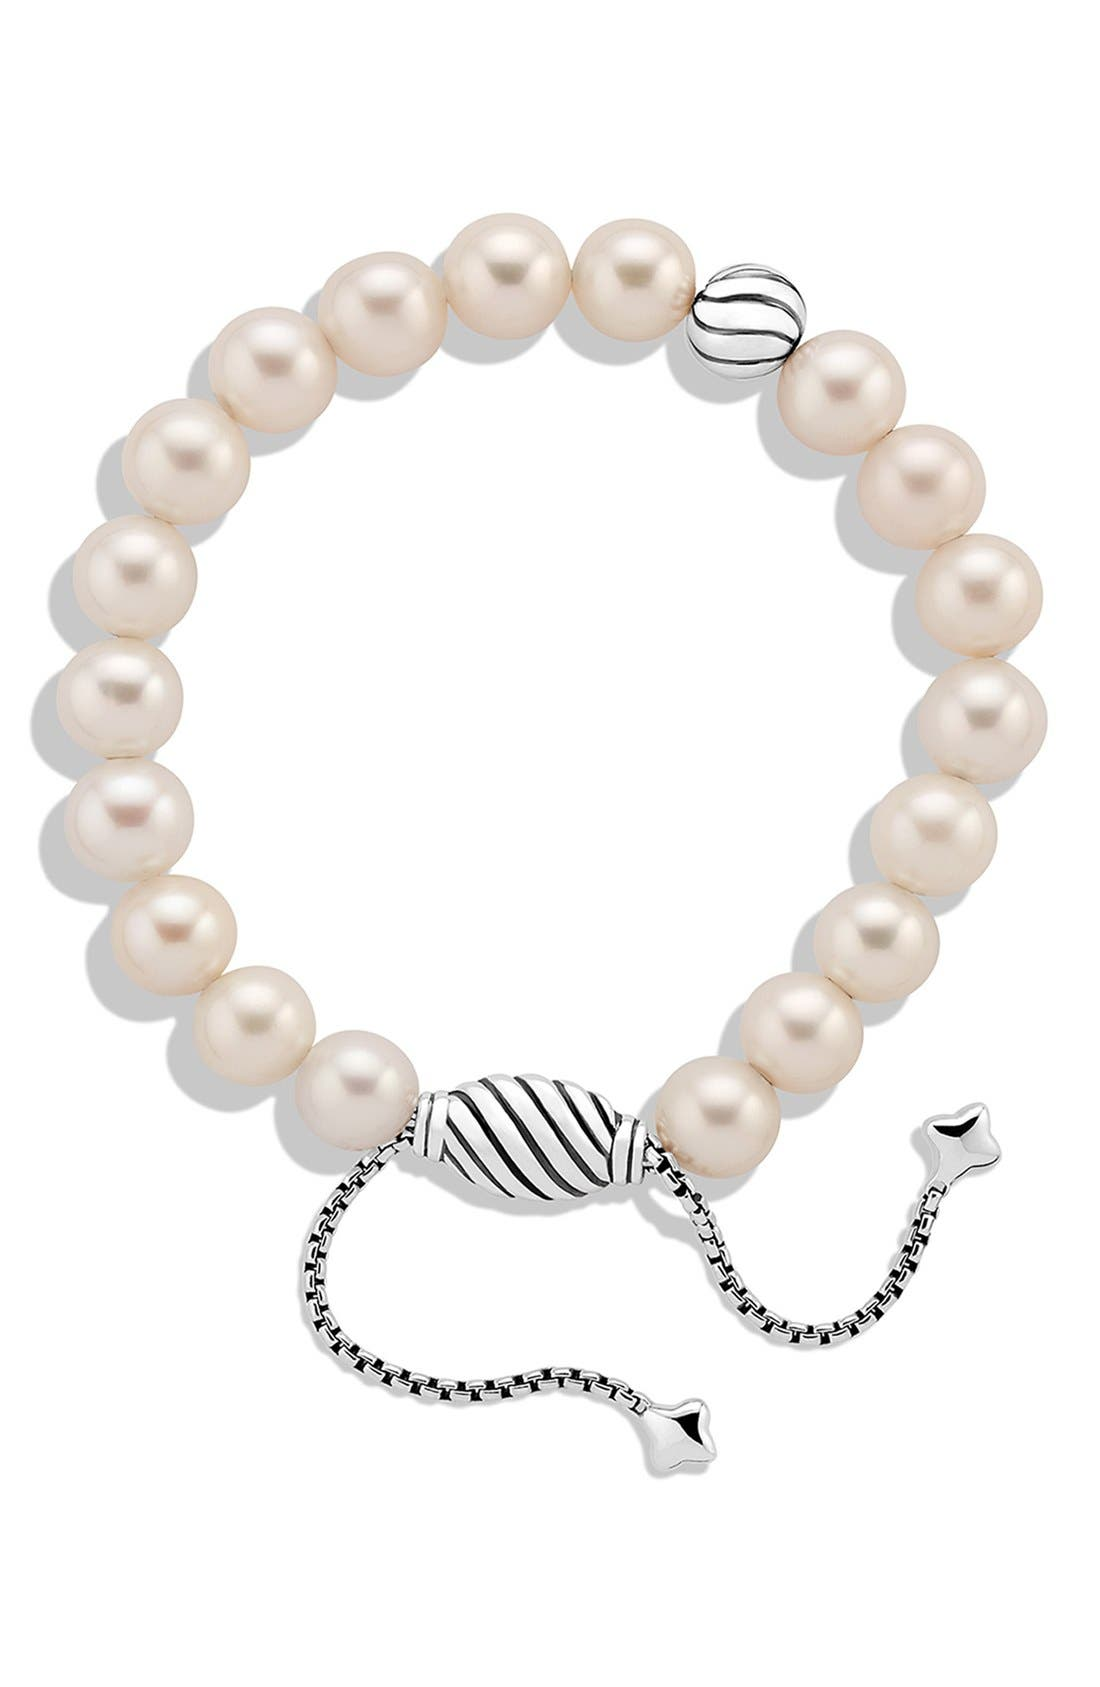 DAVID YURMAN,                             'Spiritual Beads' Bracelet with Pearls,                             Alternate thumbnail 2, color,                             101